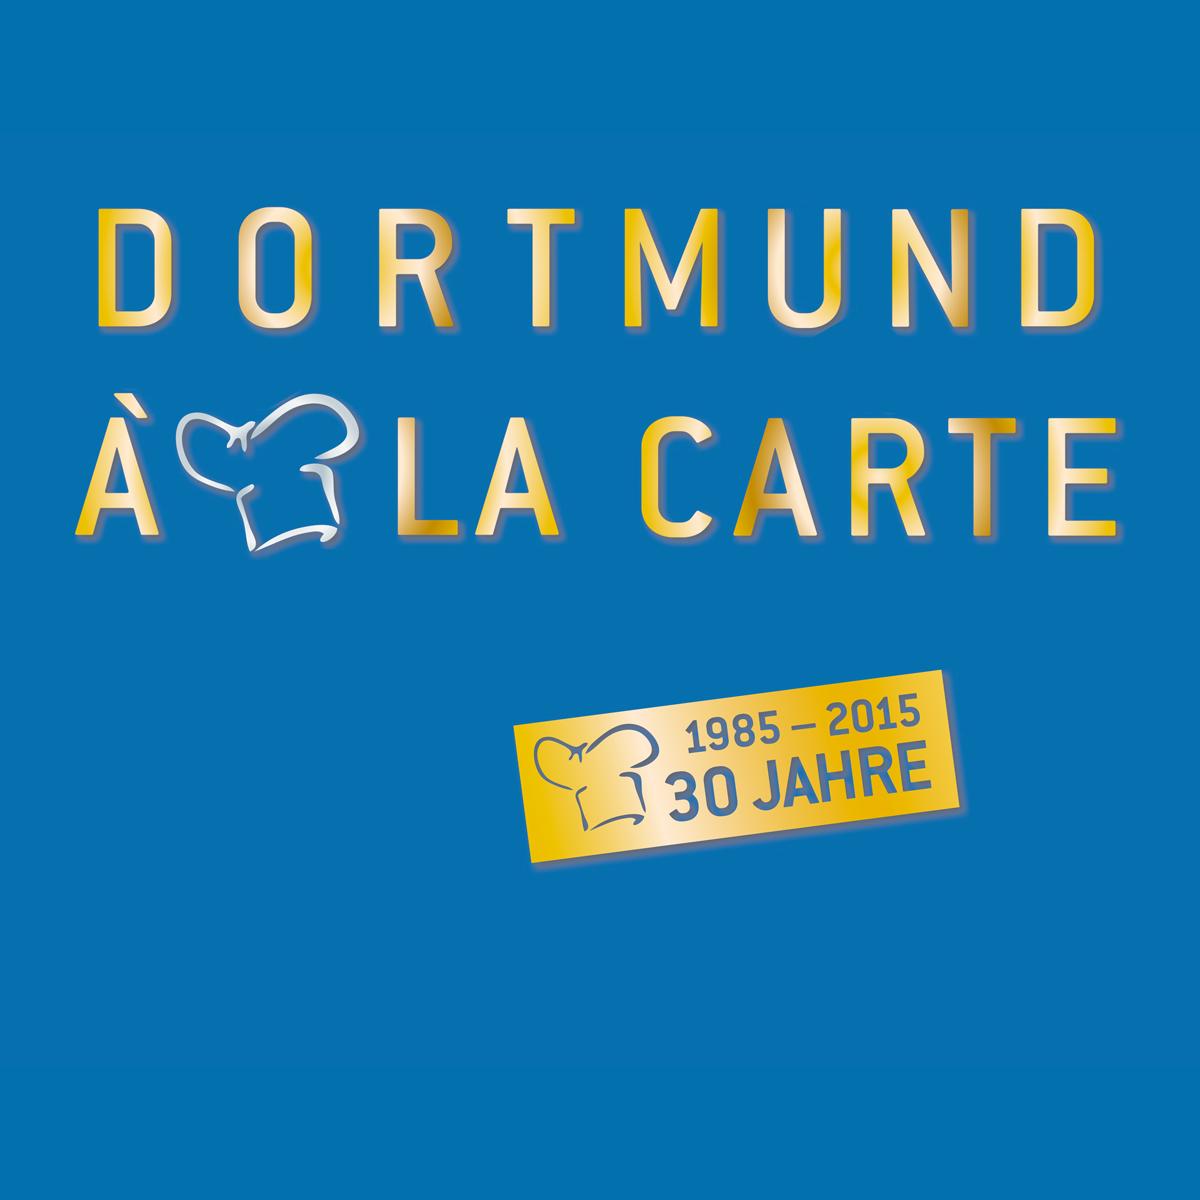 24.-27.6.2015 - Dortmund à la Carte [Dortmund]